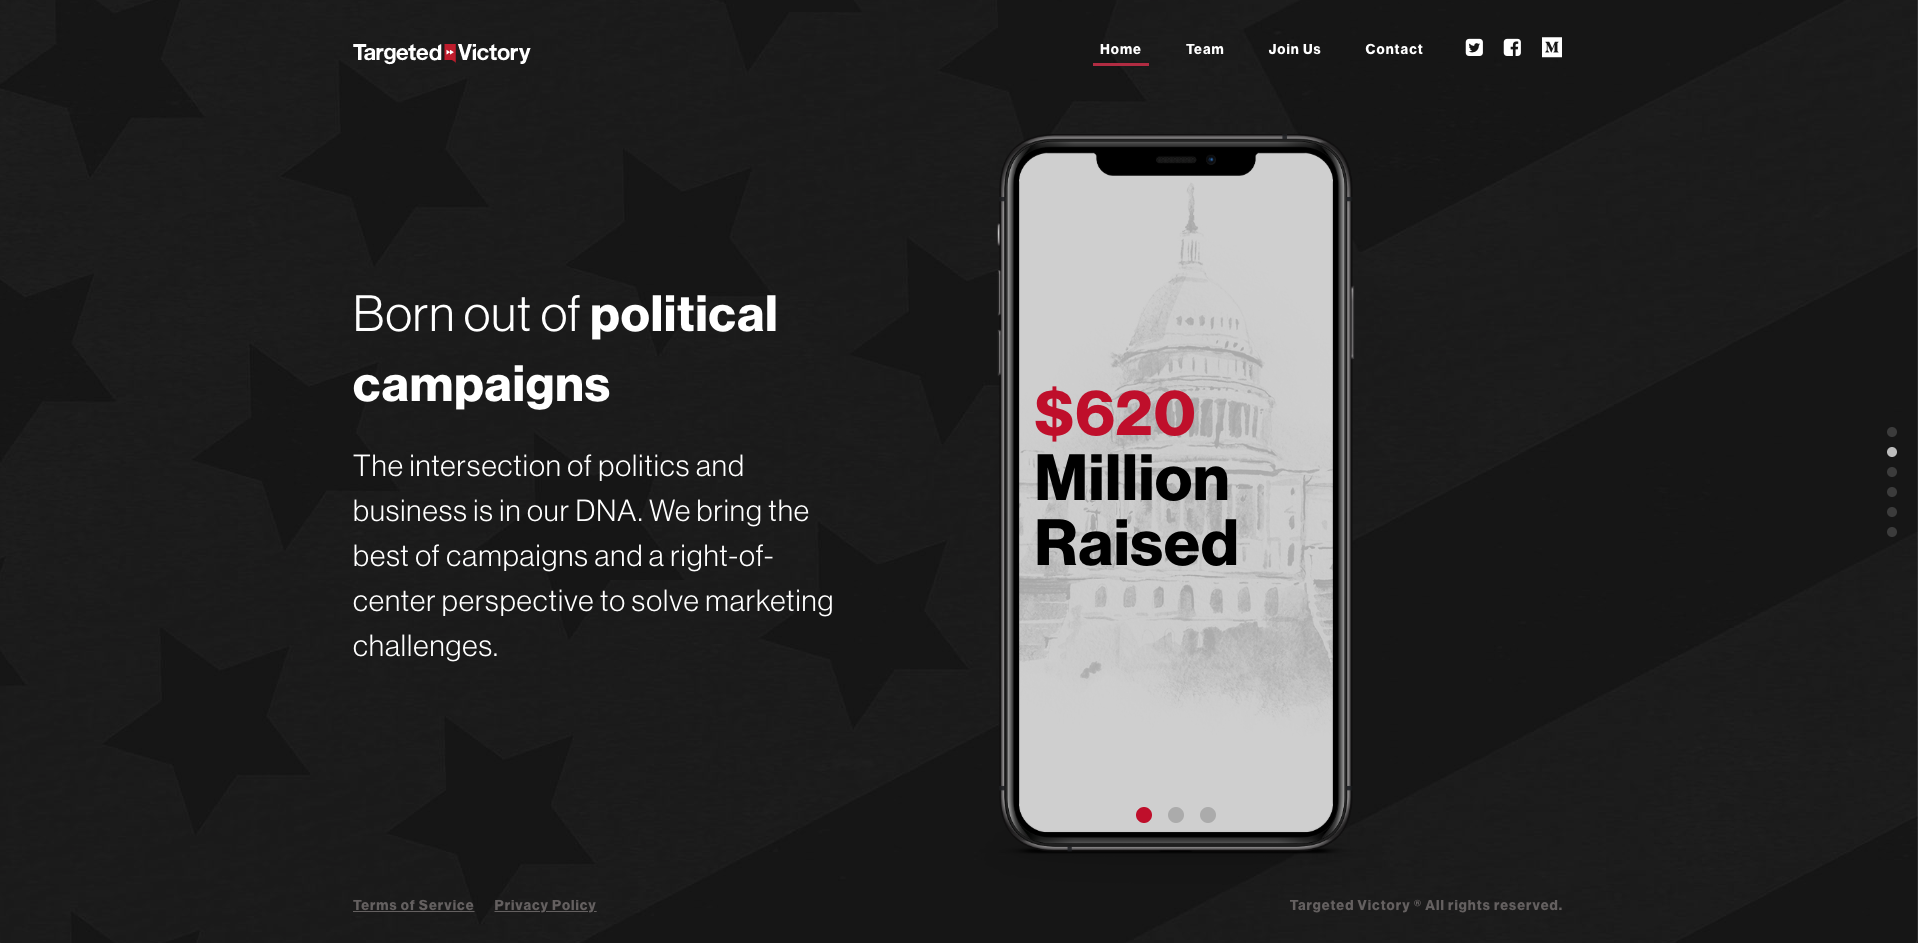 Targeted Victory website screenshot